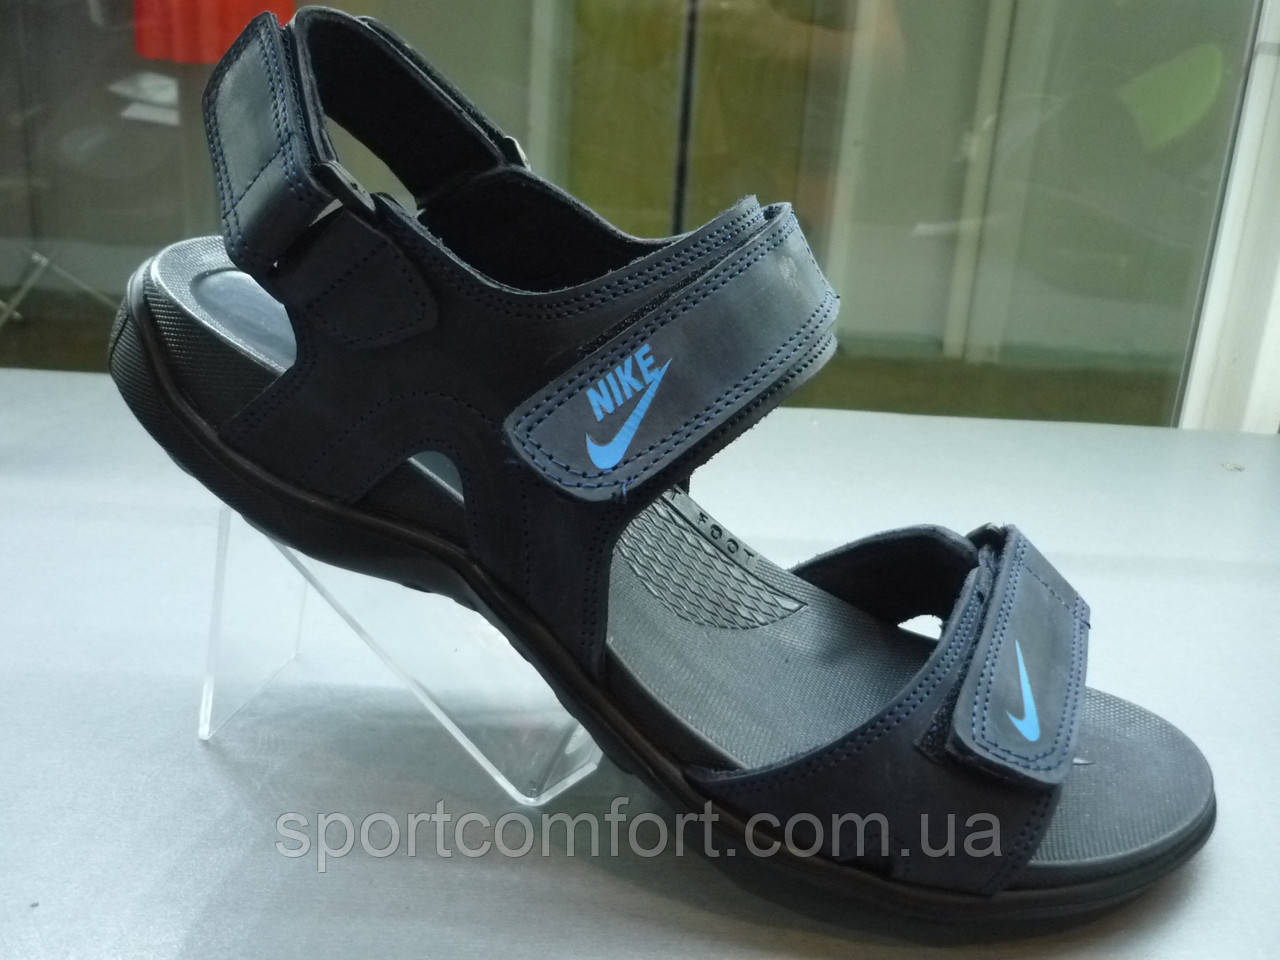 Сандалии Nike мужские коричнивые синие №8